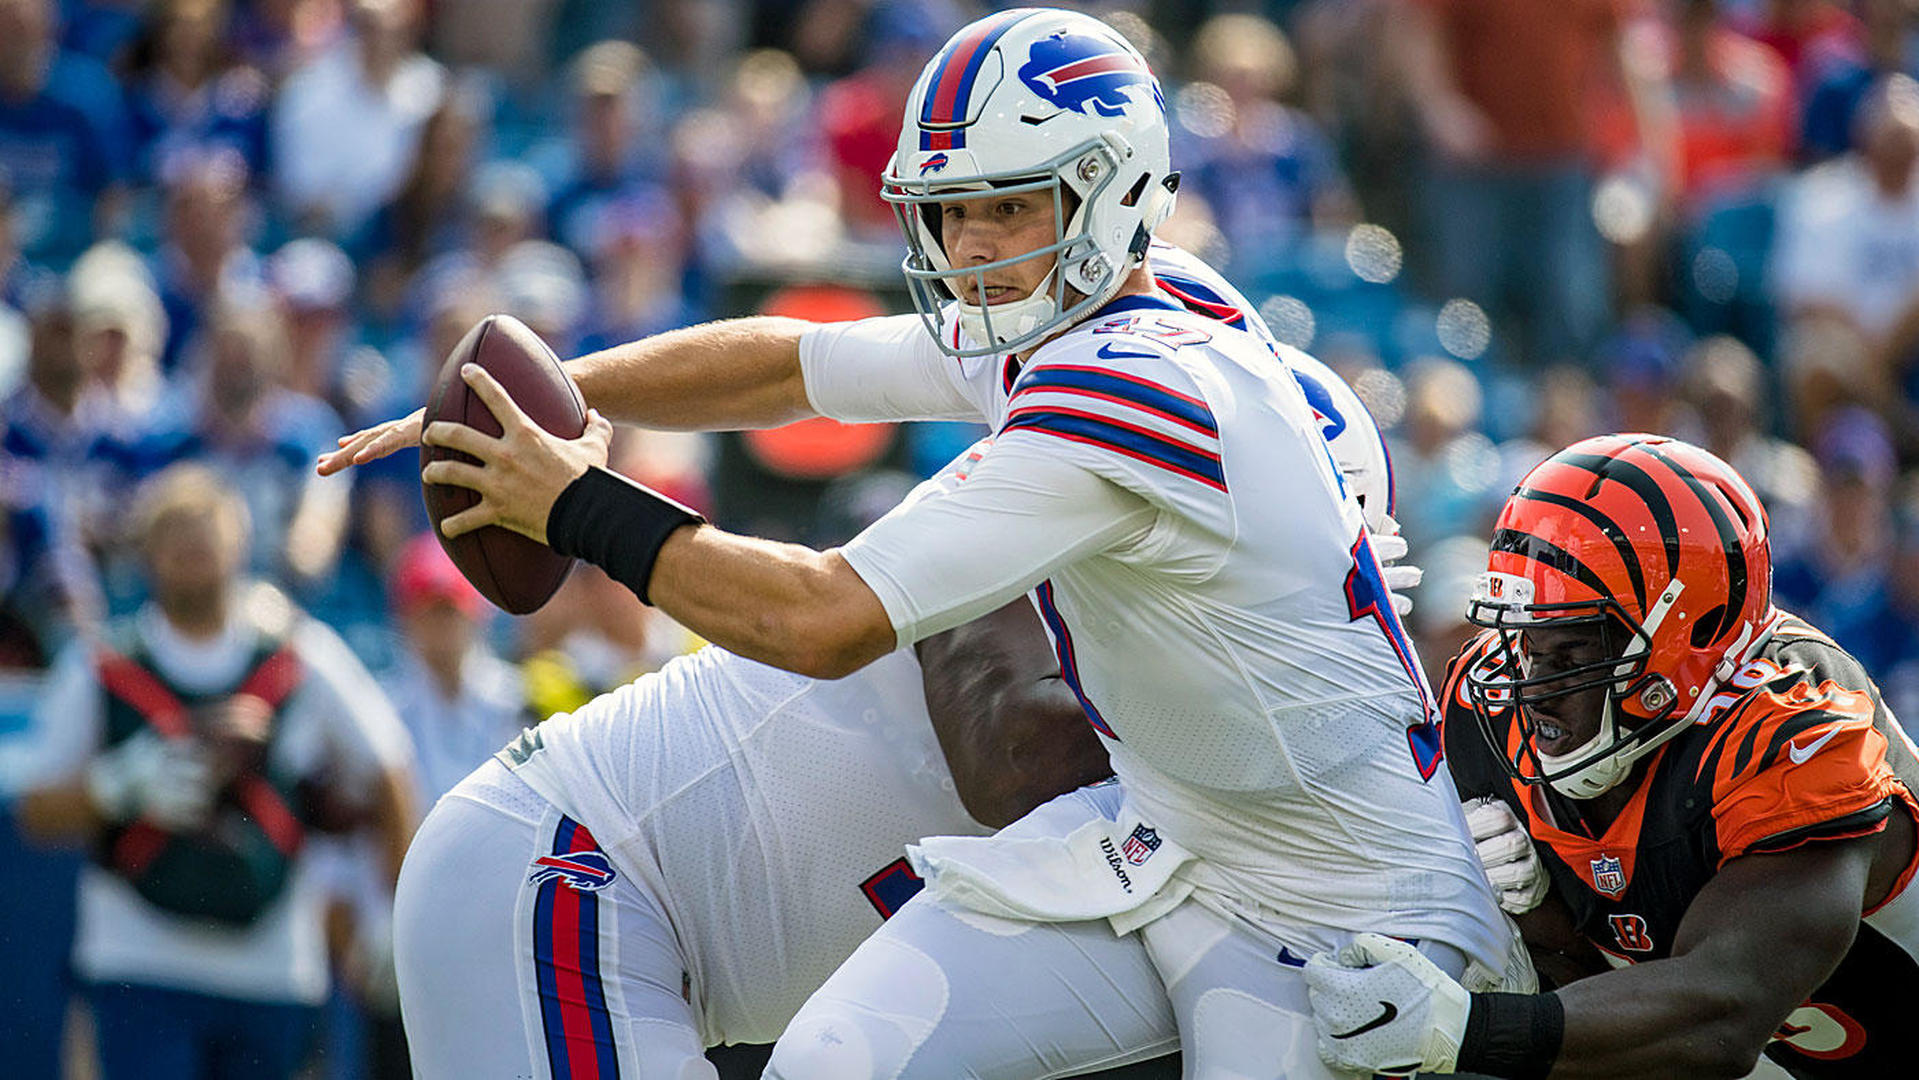 After trading AJ McCarron, Bills name 2017 fifth-rounder Nathan Peterman starting QB